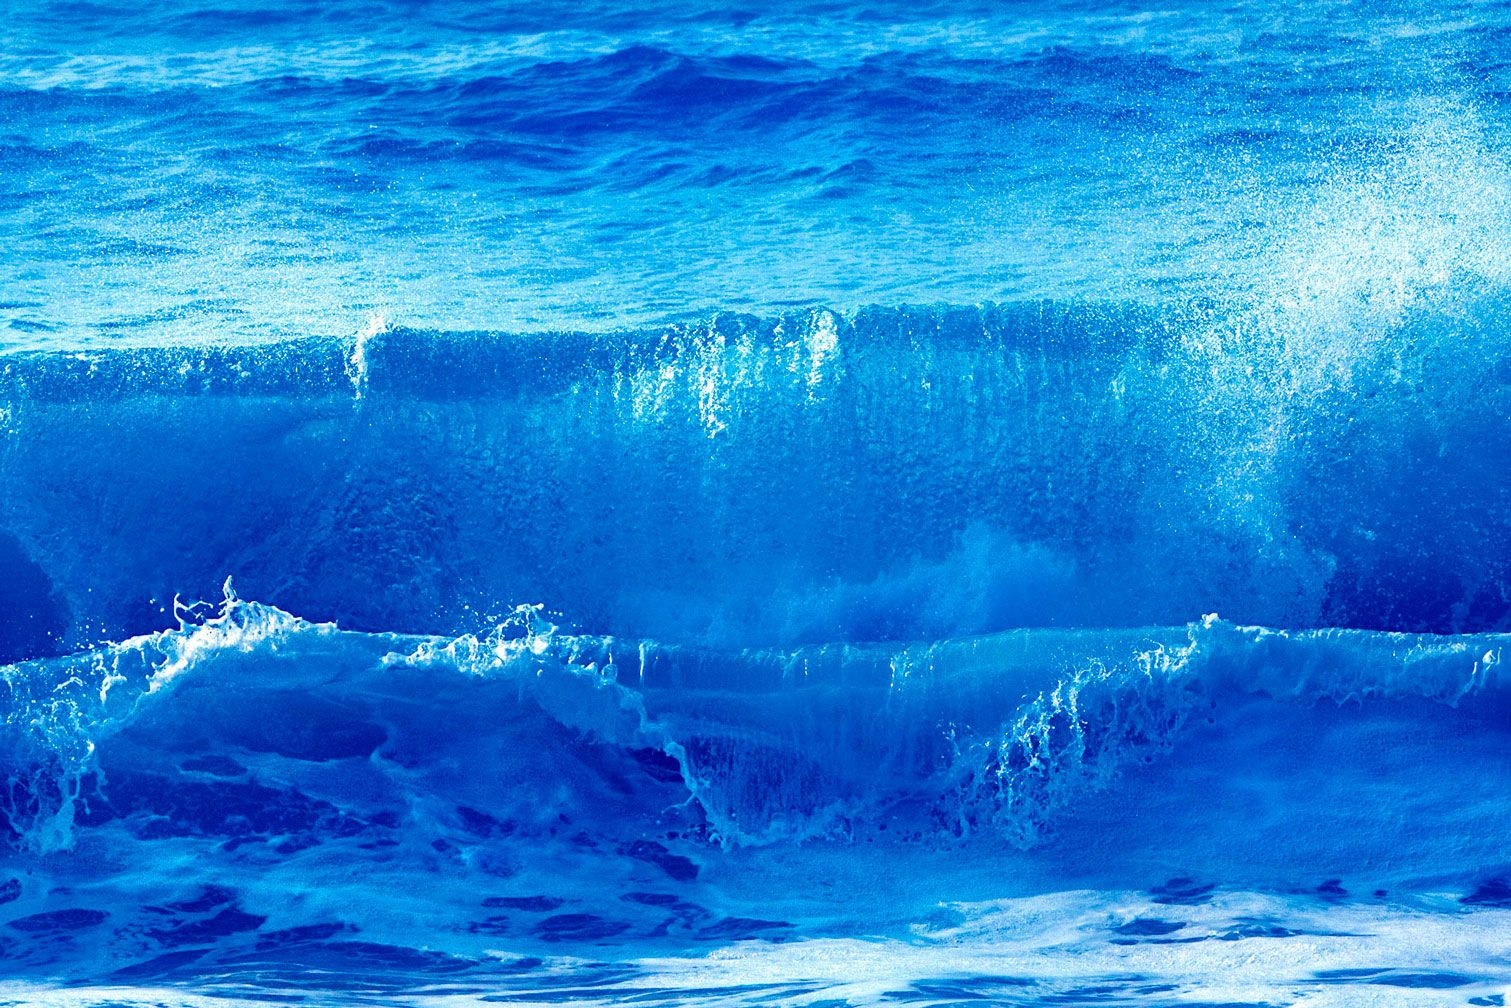 Double Barrel Wave in Blue